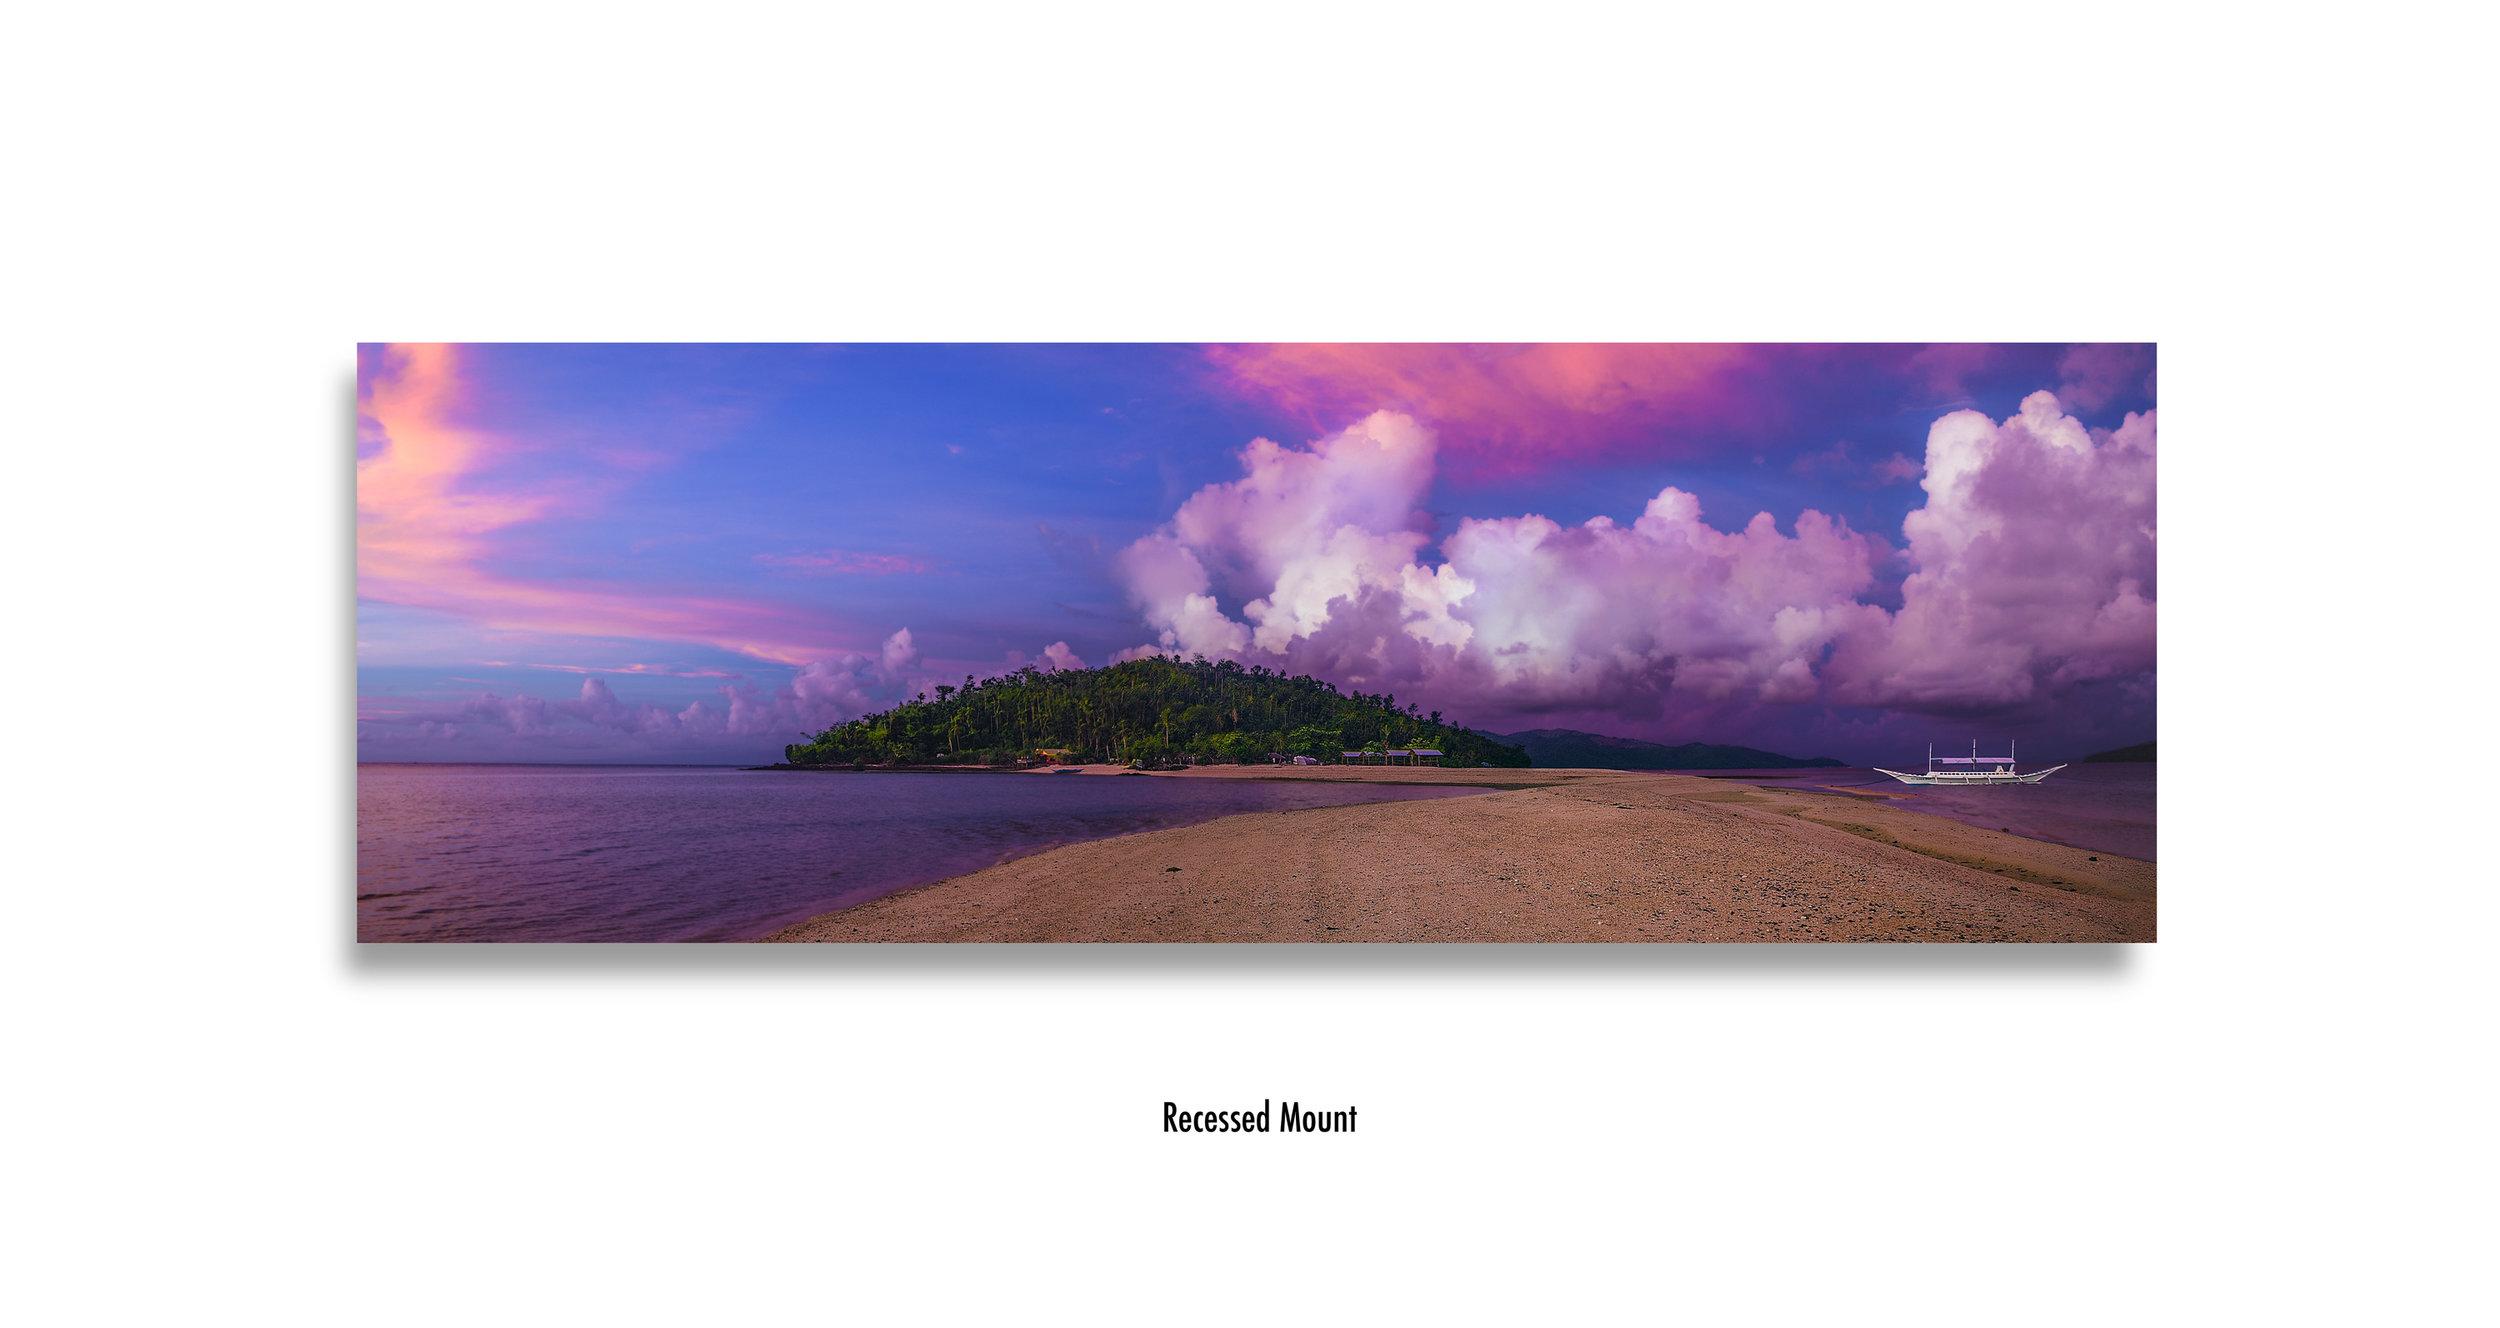 Sand-Bar-Isle-recessed-mount.jpg